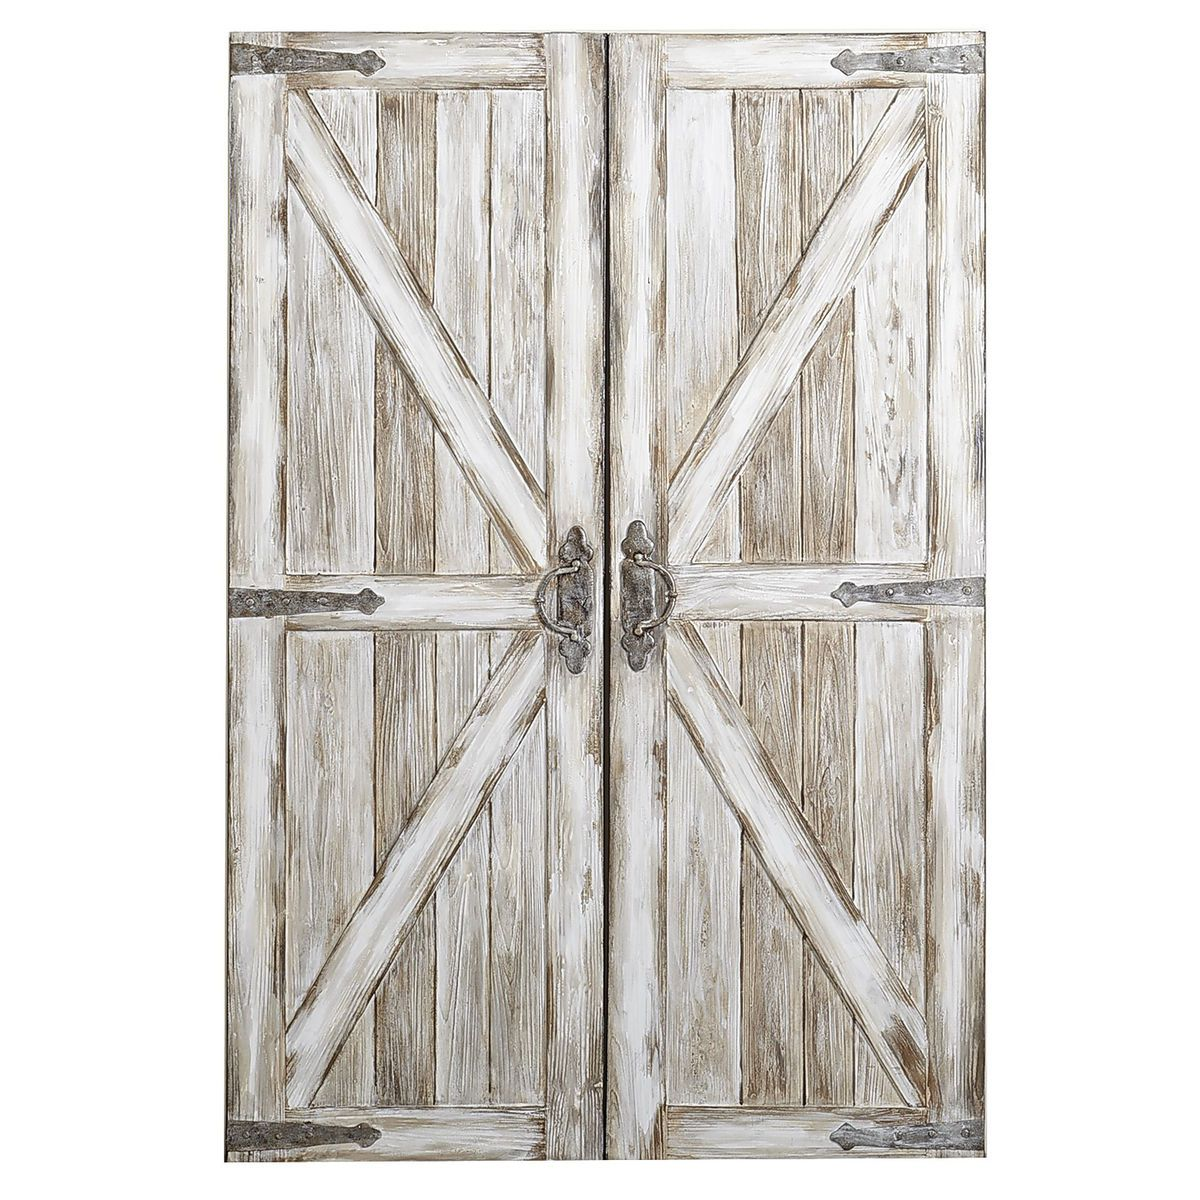 Rustic Barn Doors Art   Antique White   Acrylic   Home Decor Wall Art Ideas